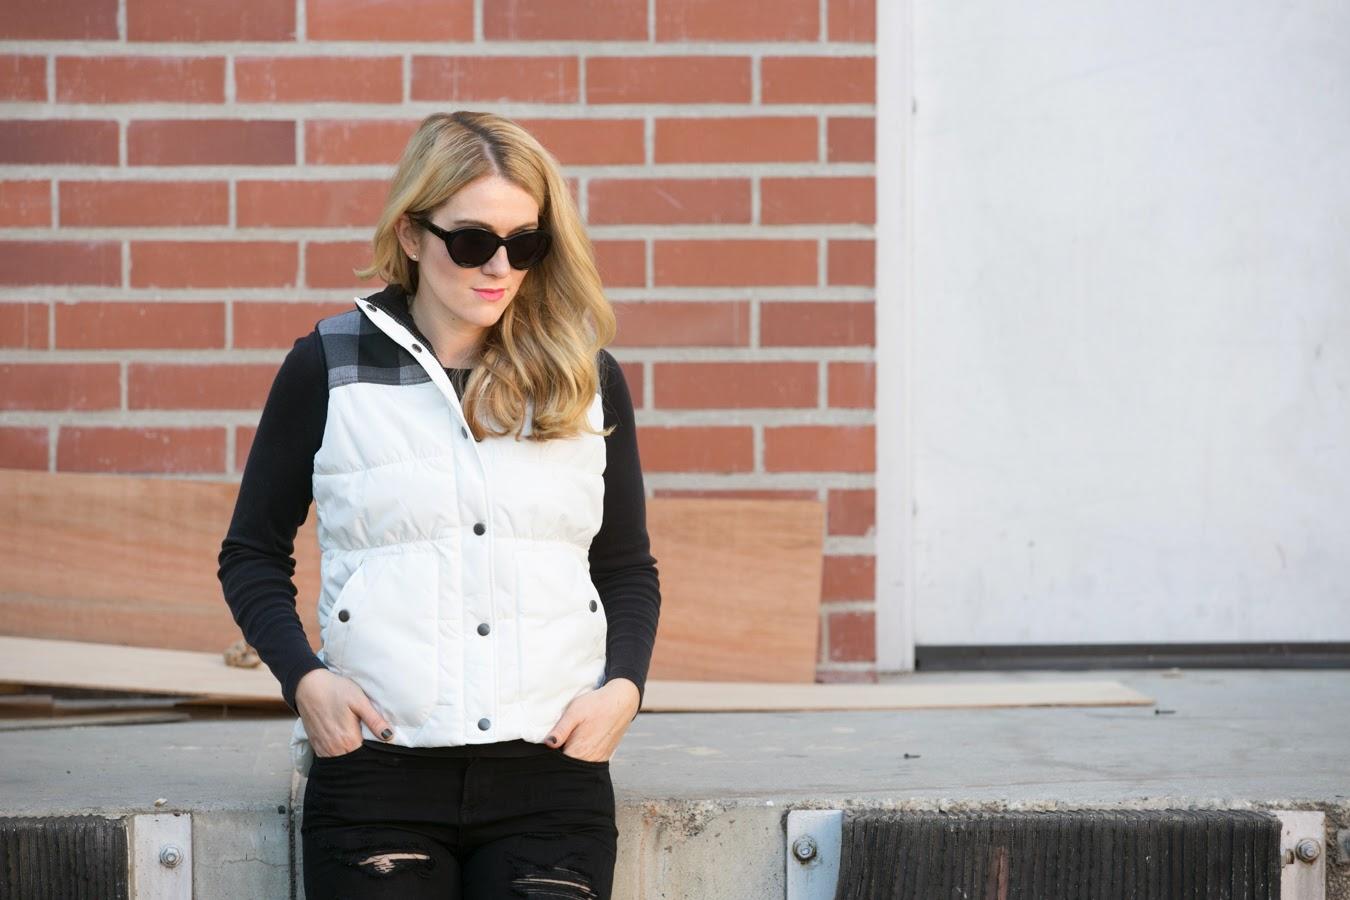 Black + White | White Eddie Bauer Puffer Vest w. Plaid Shoulders + Black Distressed Jeans + Black Croc Sneakers | Luci's Morsels :: LA Denim Blogger